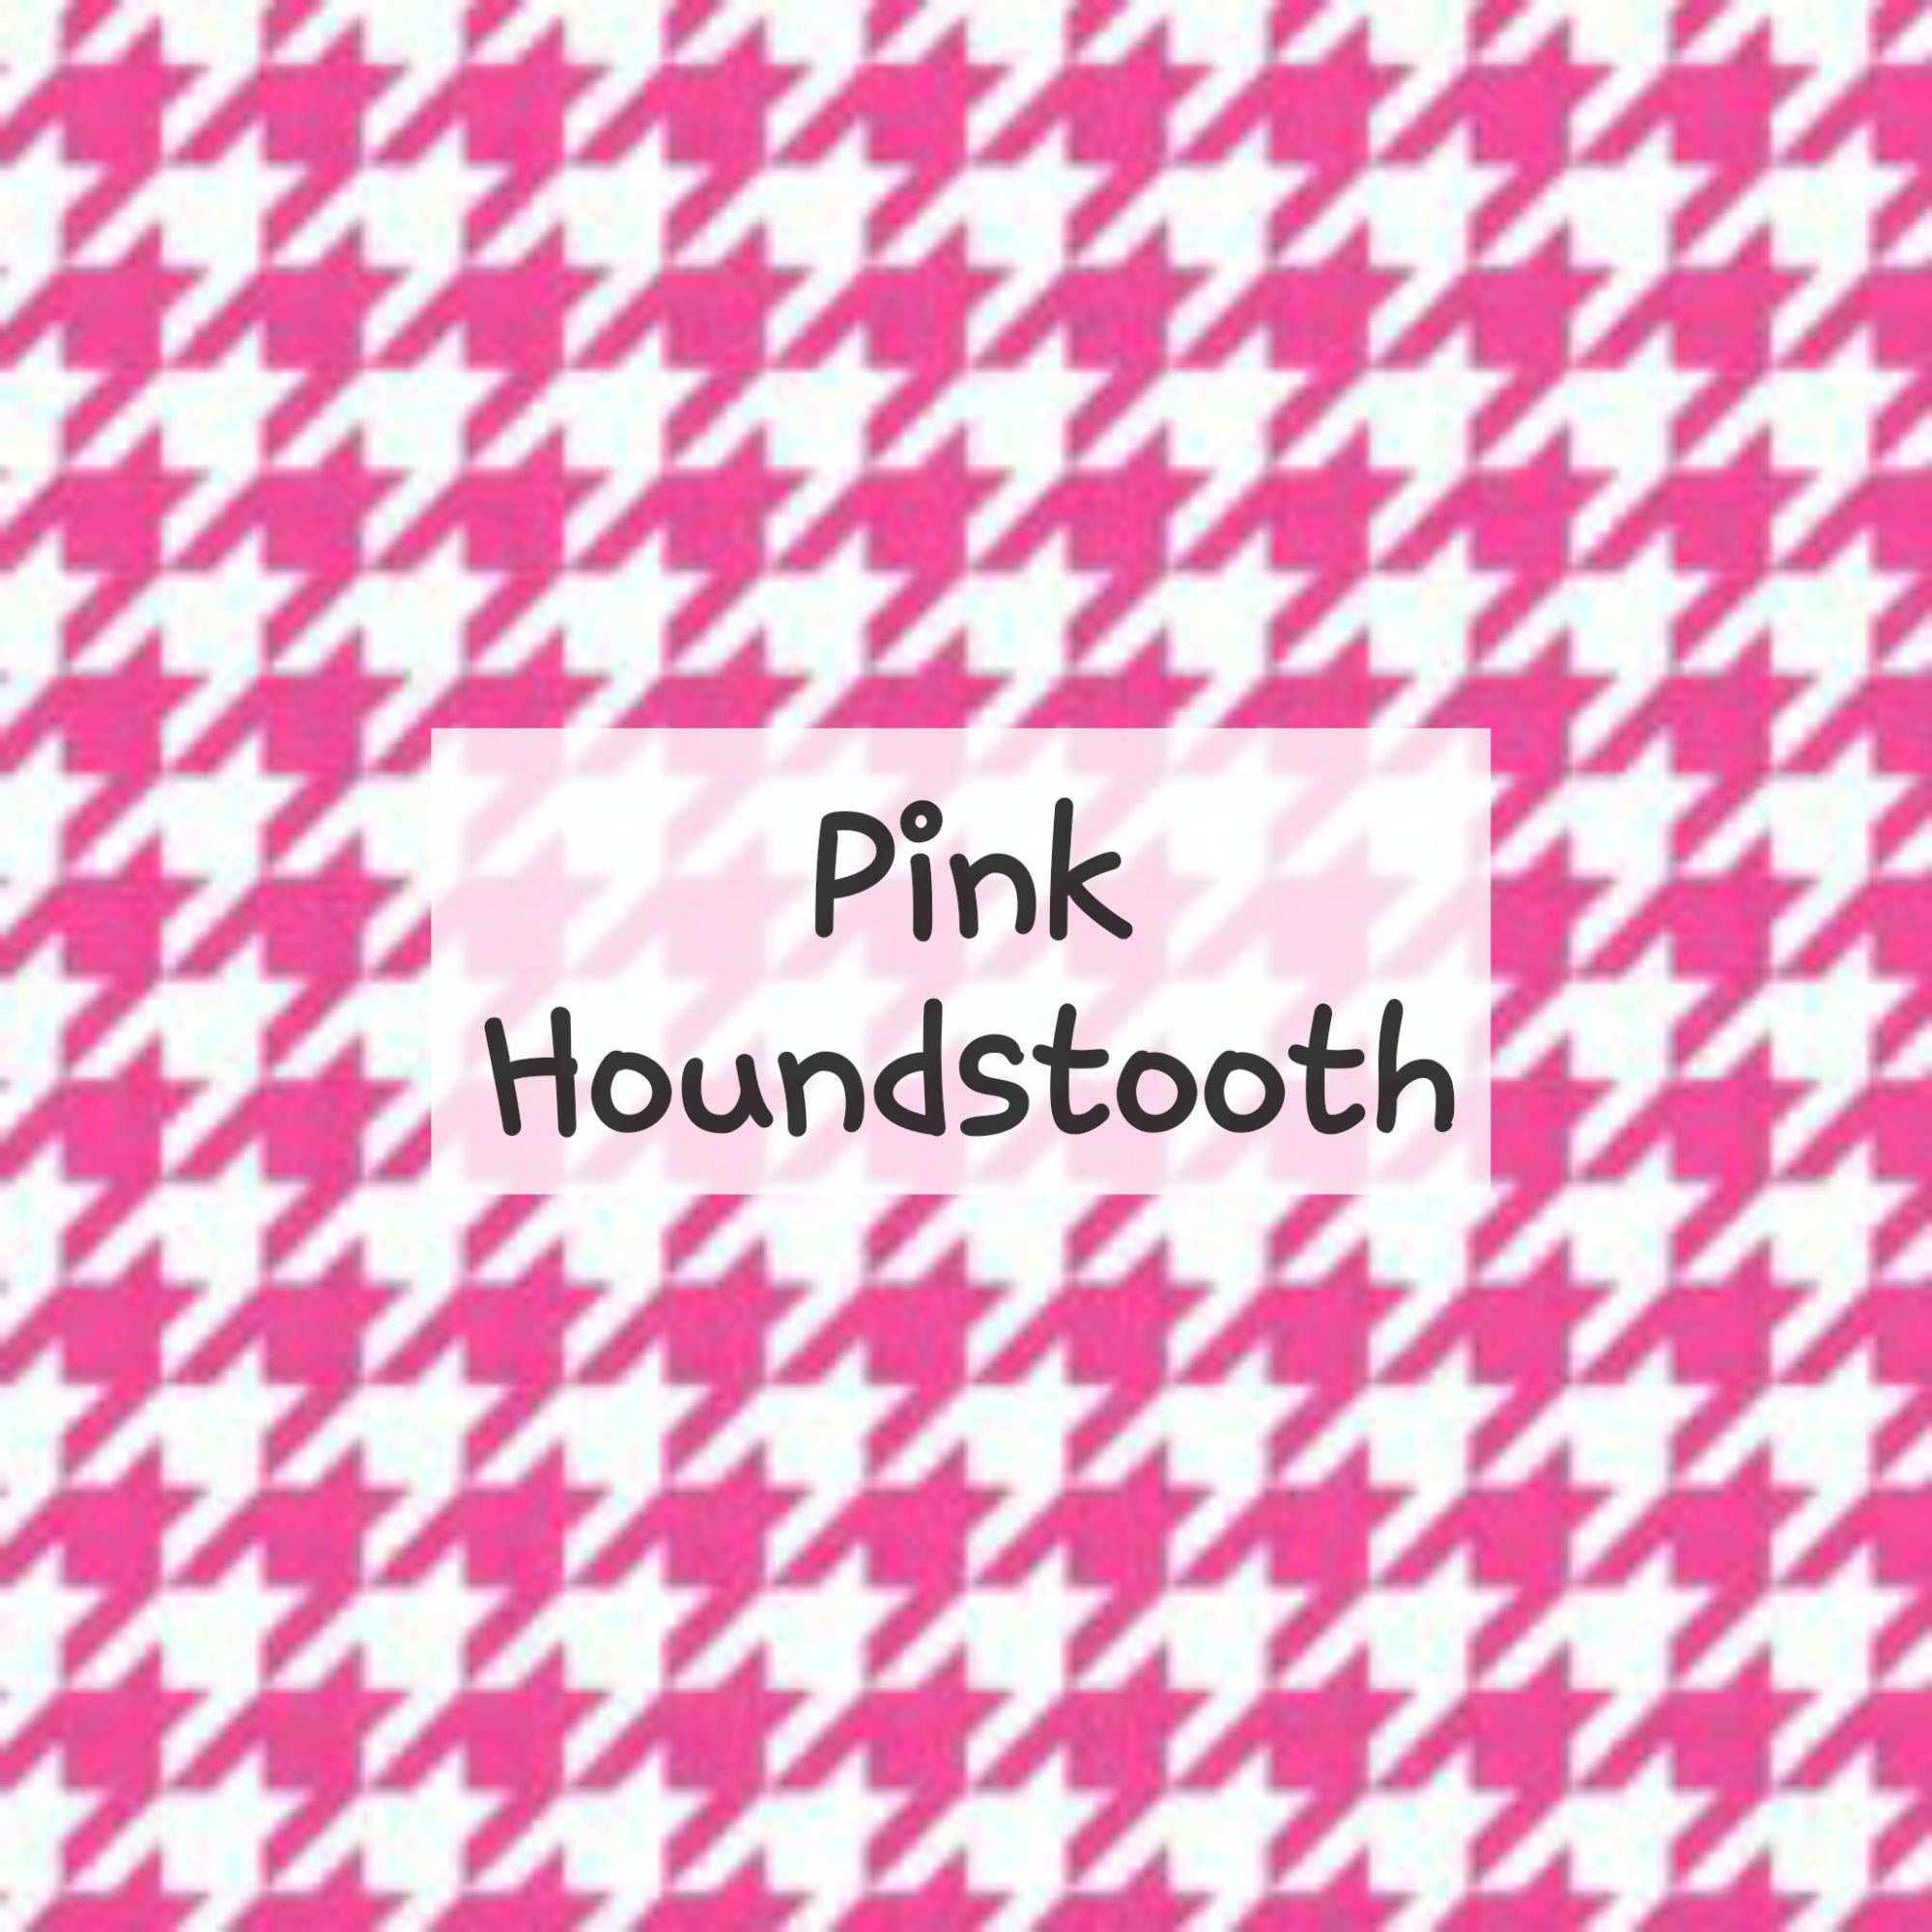 Pink Houndstooth